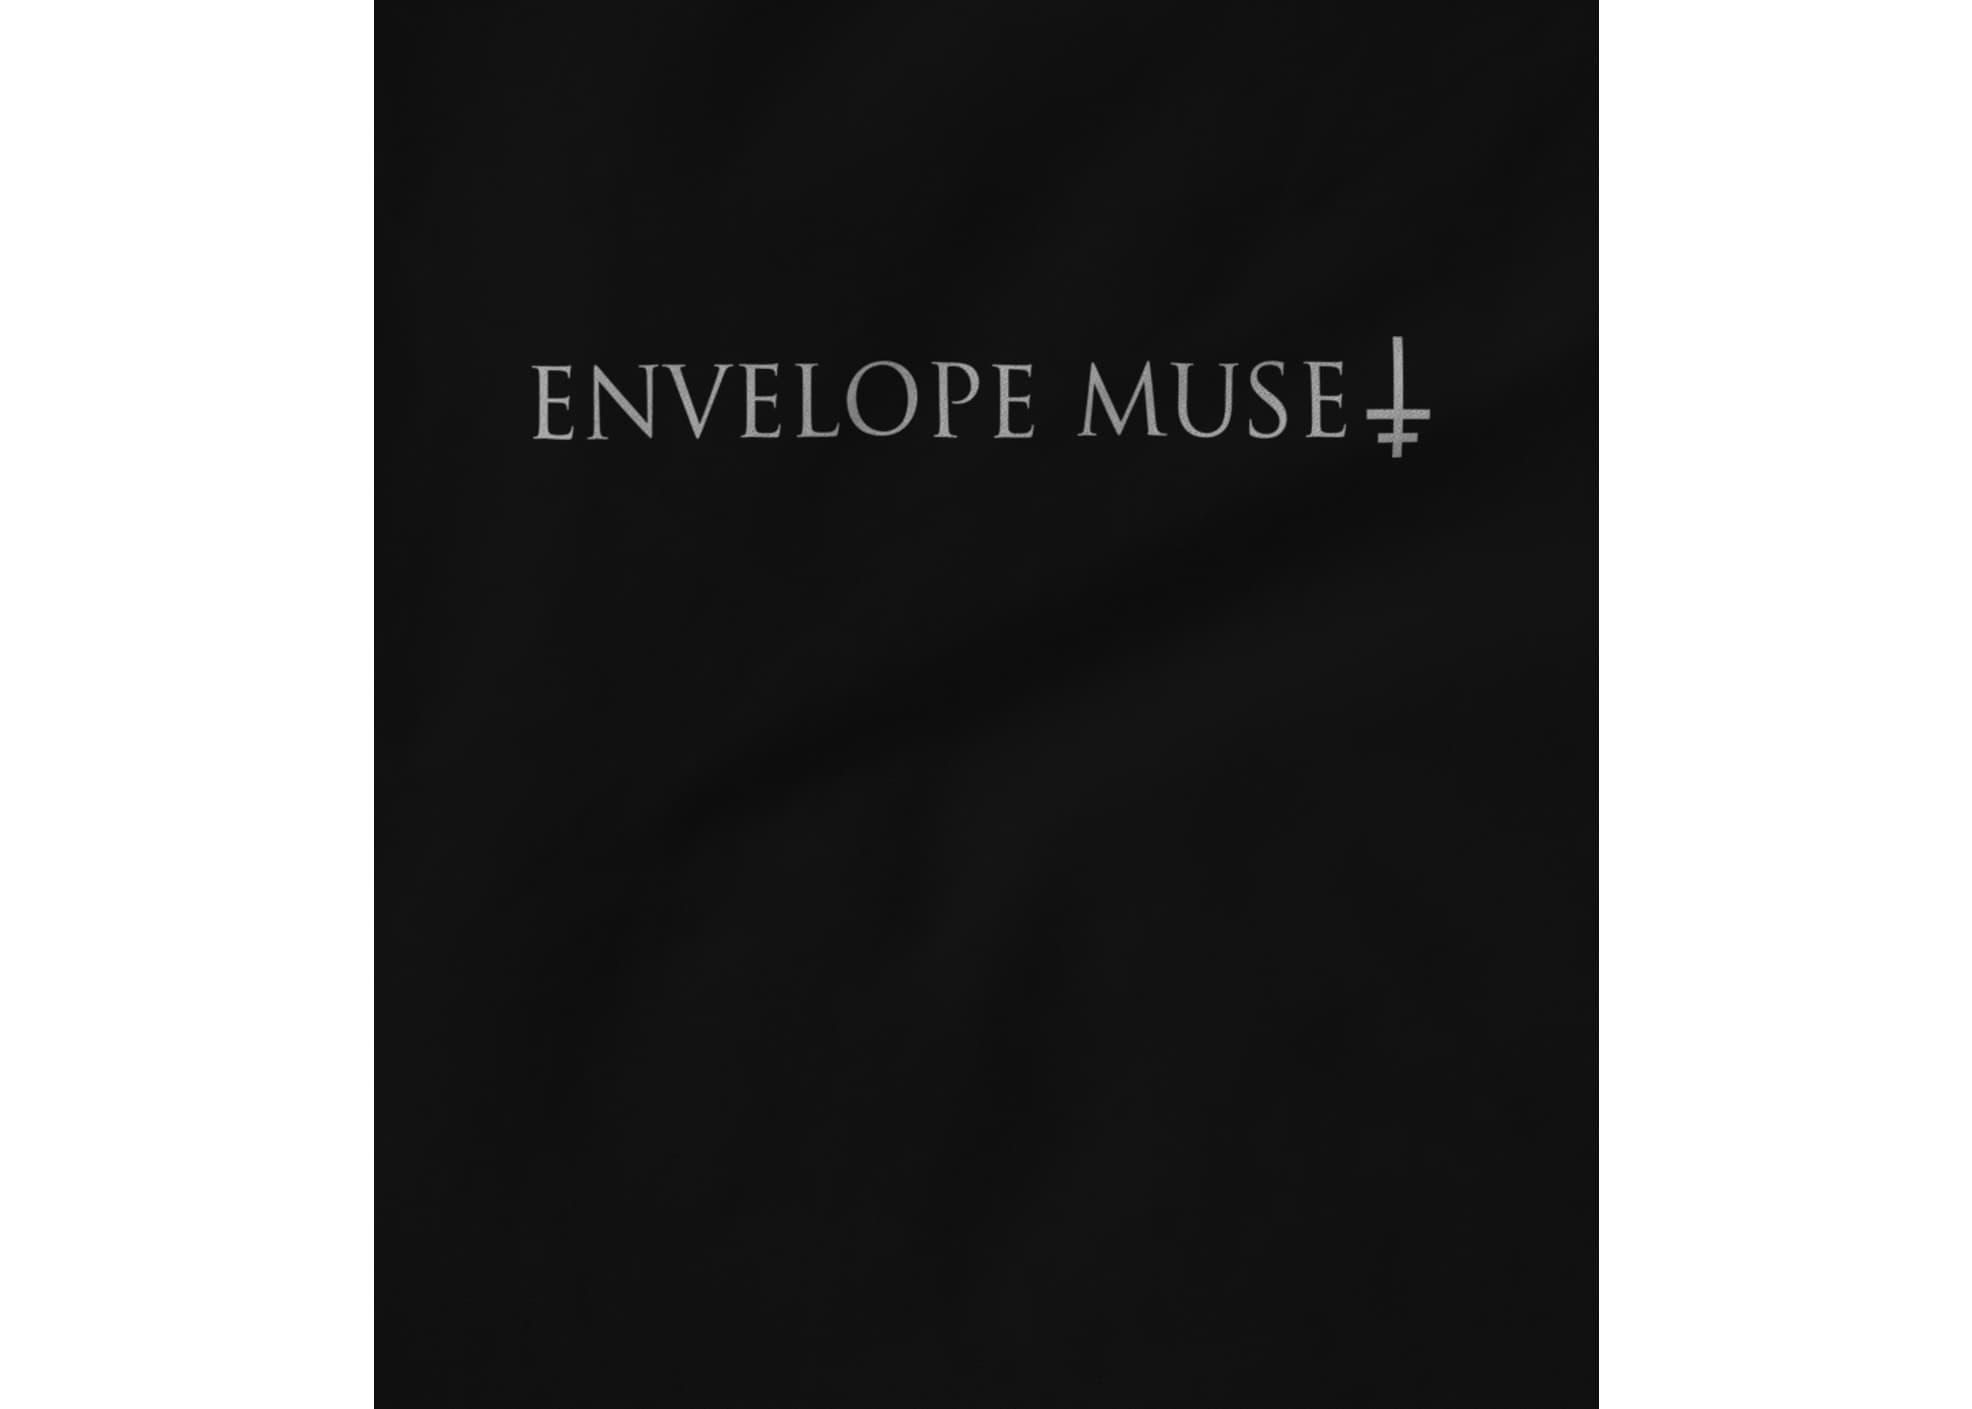 Envelope muse  protection   balance hoodie 1631149464